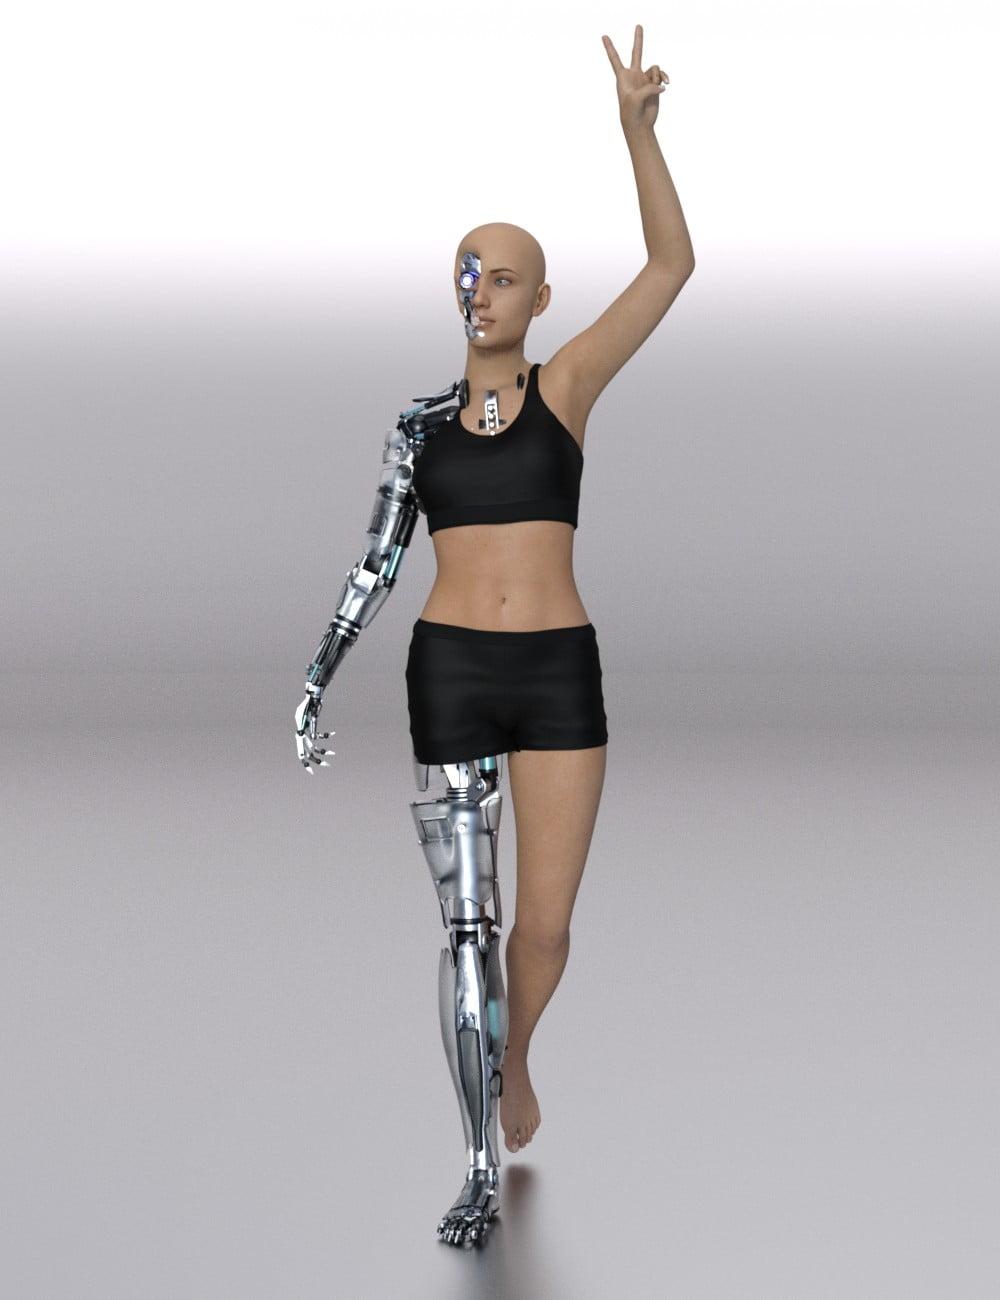 Cyborg Generation 8 Female